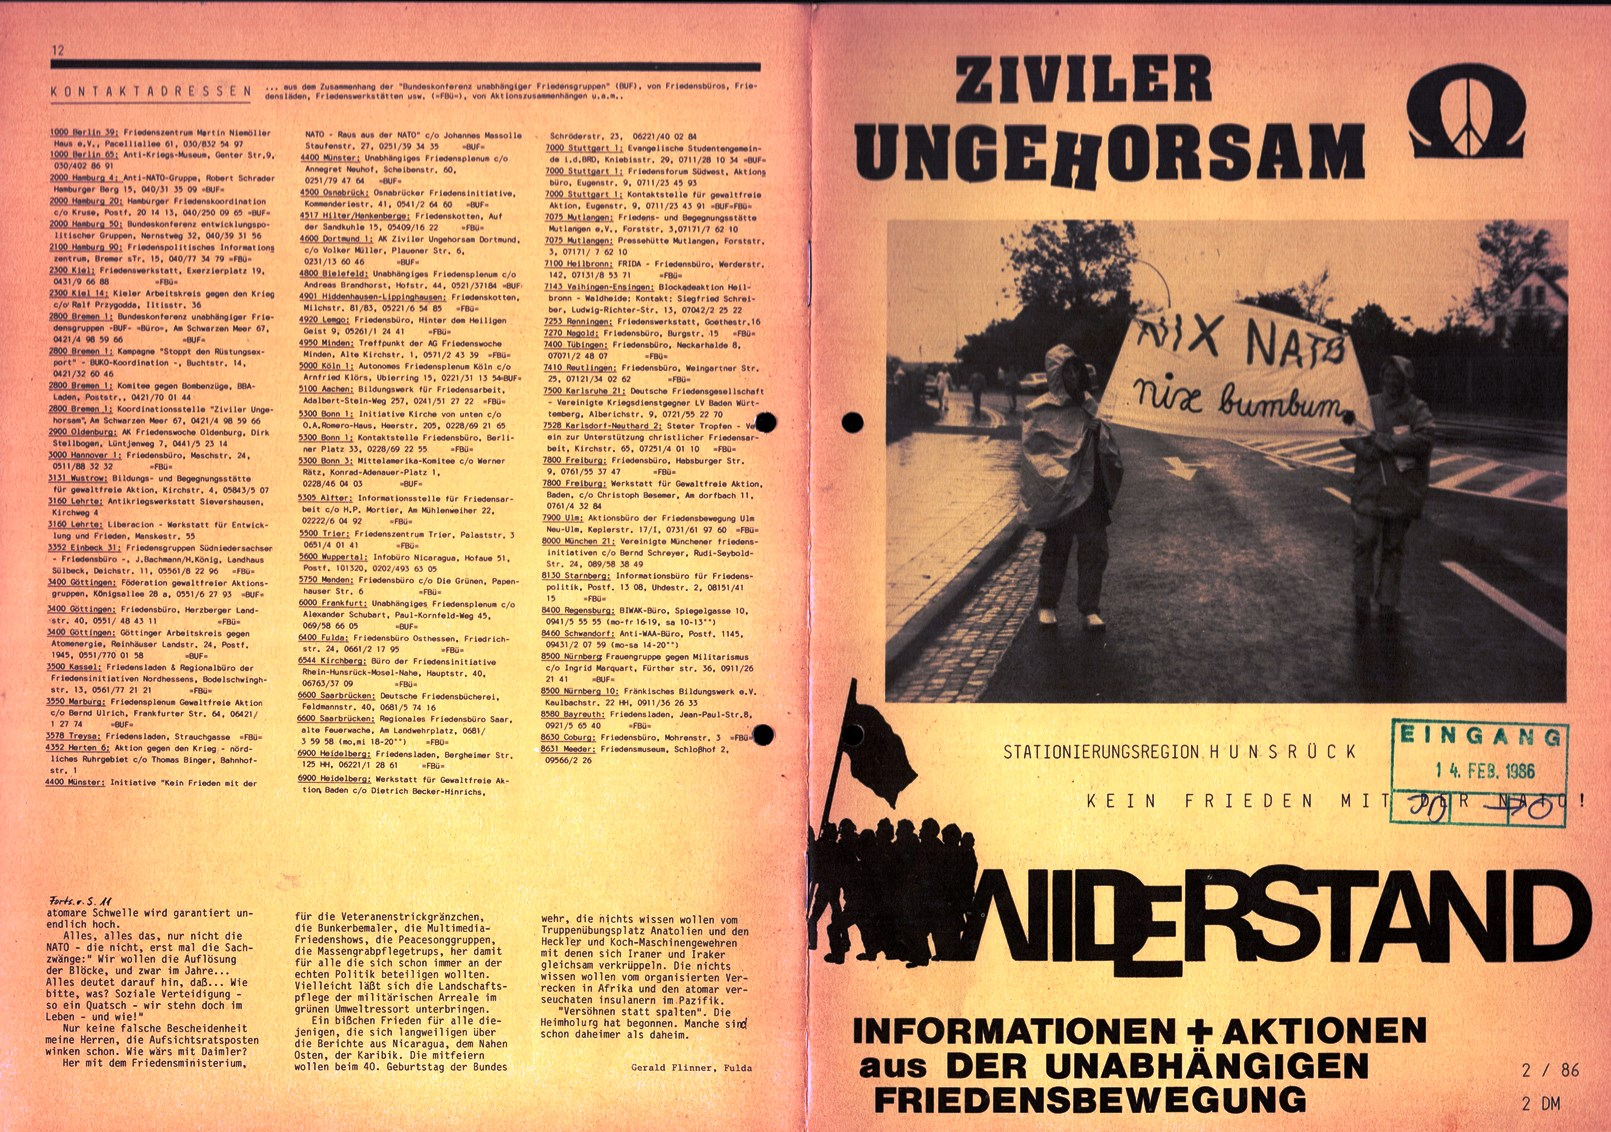 Ziviler_Ungehorsam_1986_002_001